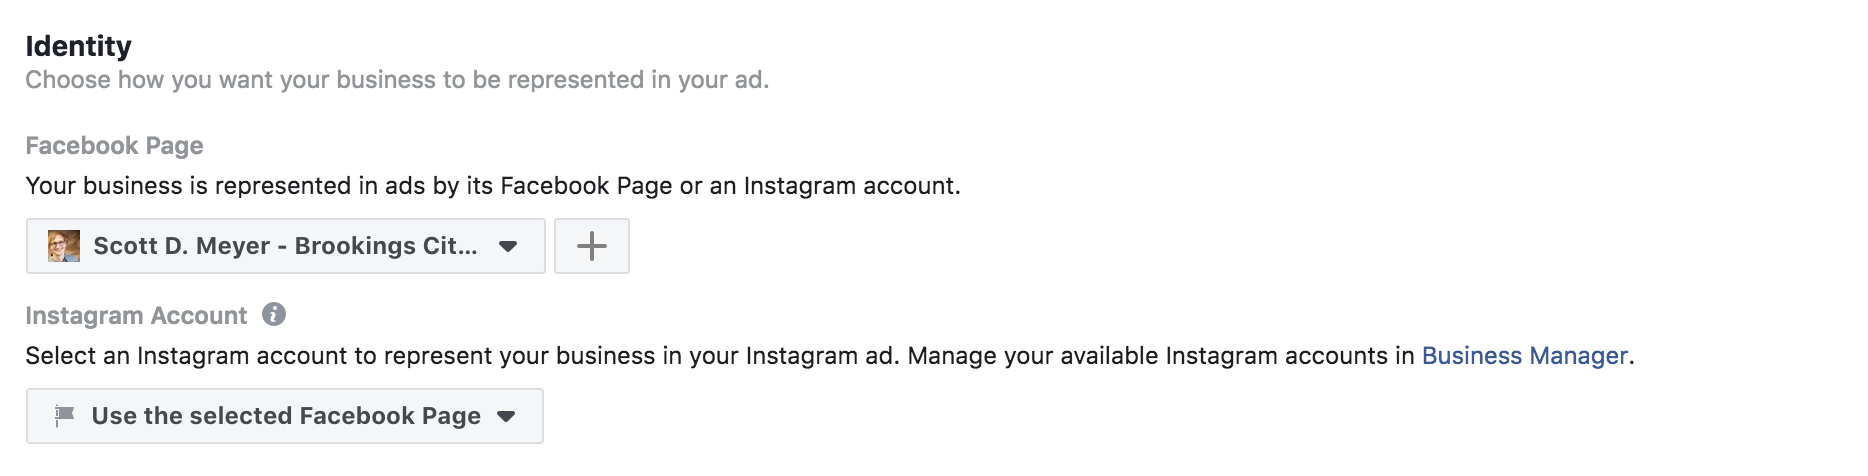 facebook ad identity